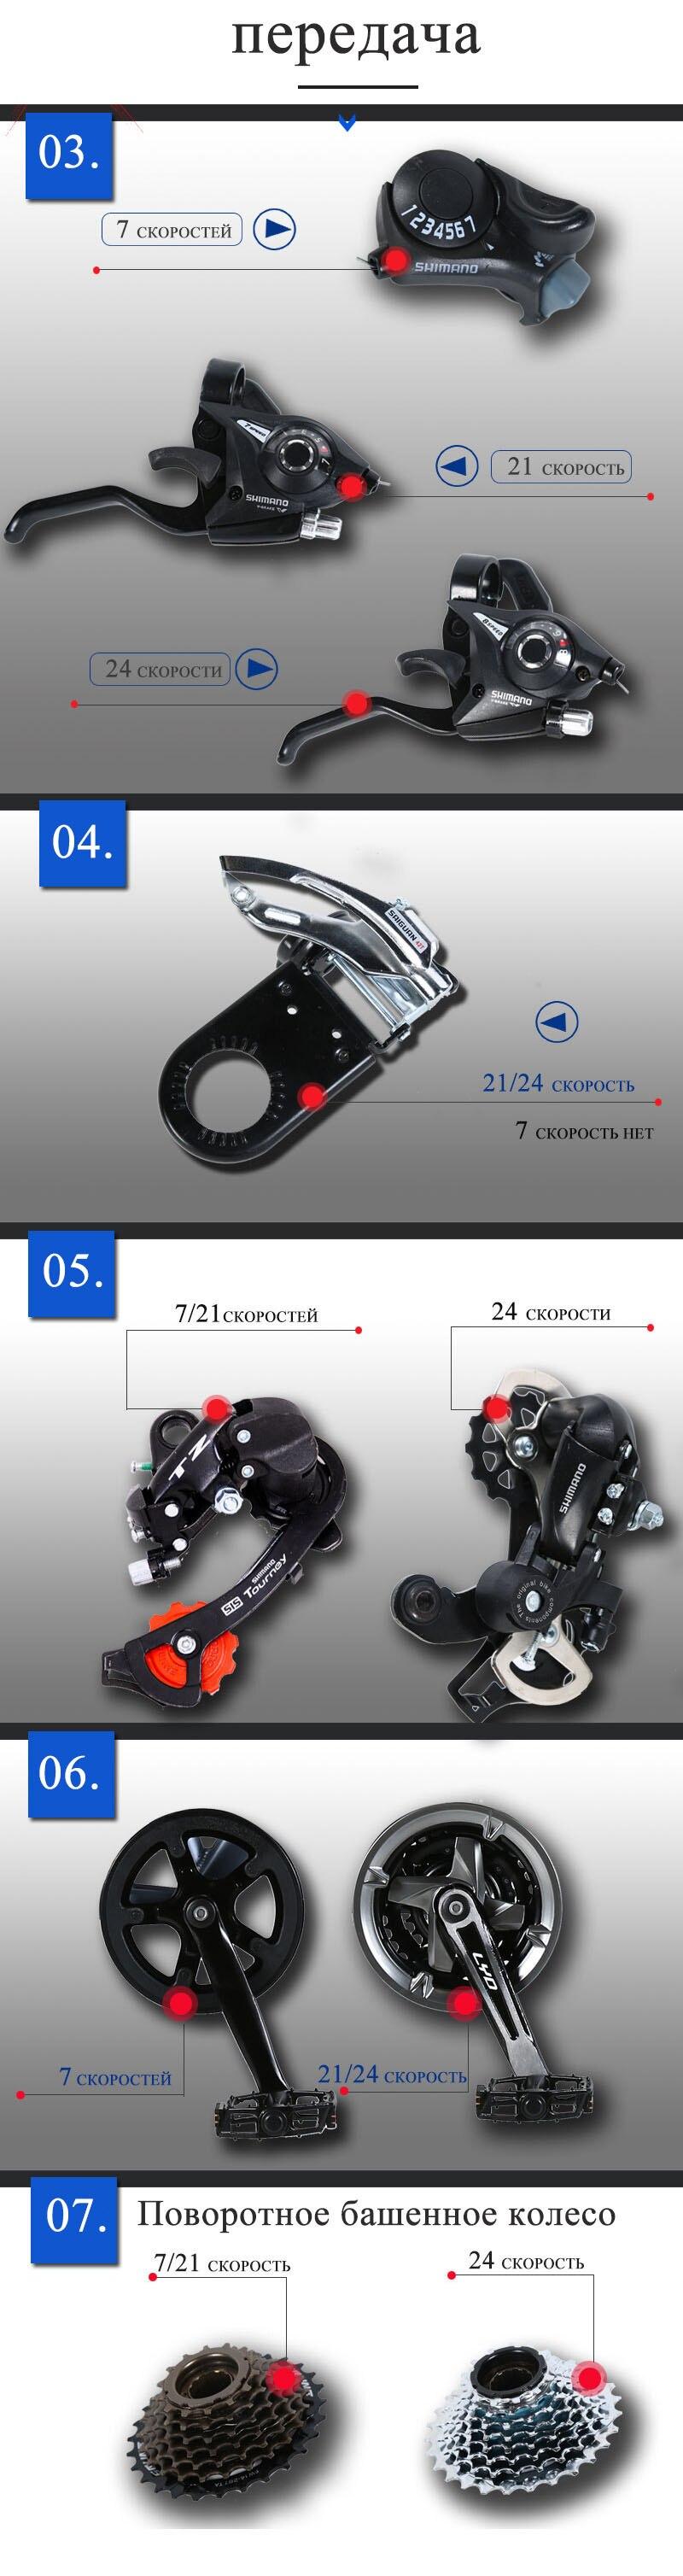 "Ha5fe33e5b7e54228b6f75058f07b17d0y wolf's fang Mountain bike bicycle aluminum frame 7/21/24 speed mechanical brakes 26 ""x 4.0 wheels long fork Fat Bikes road bike"